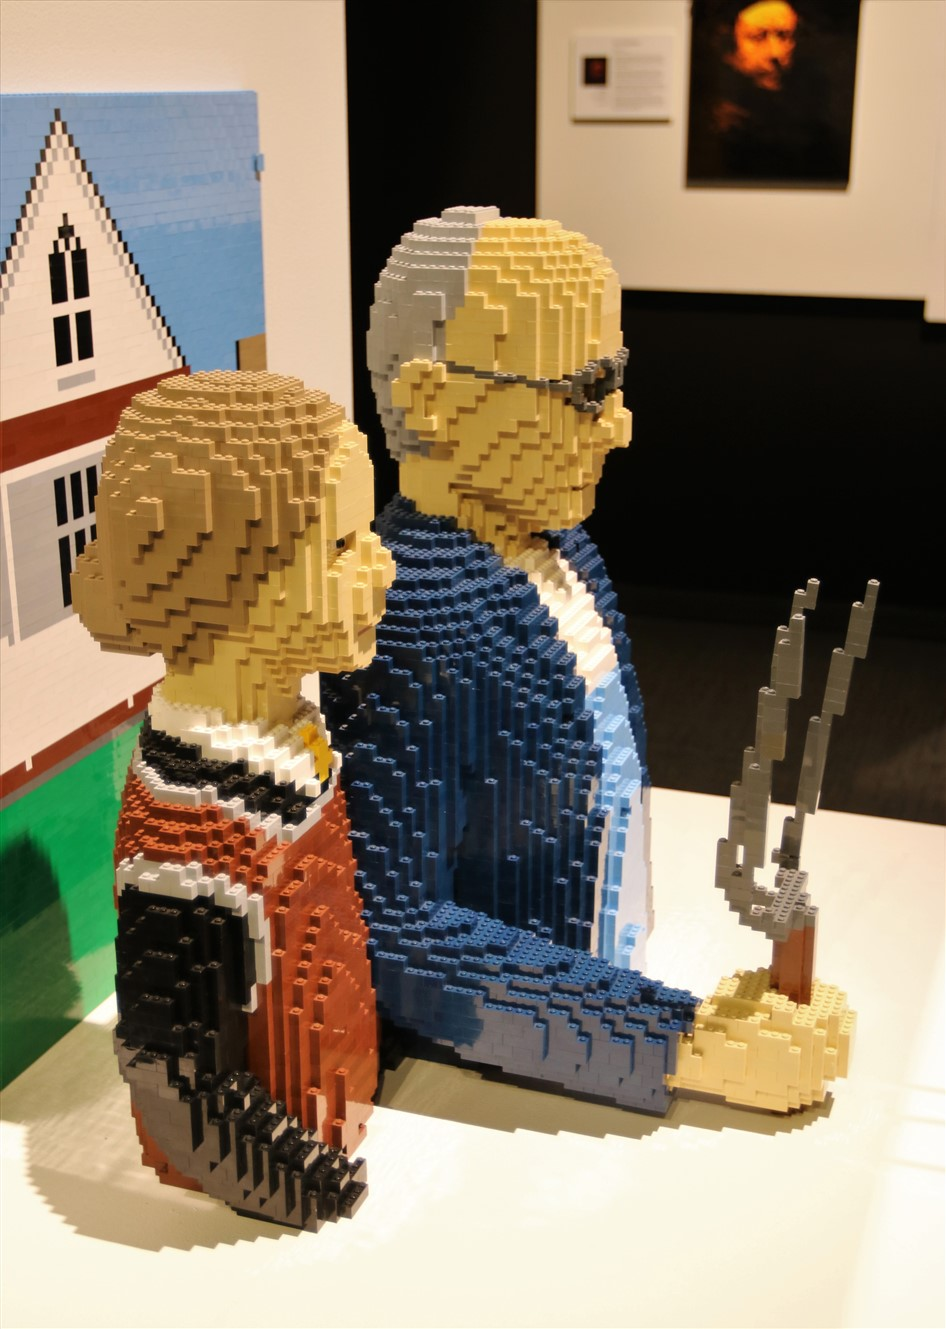 2018 07 08 48 Pittsburgh Carnegie Science Center Art of the Brick.jpg